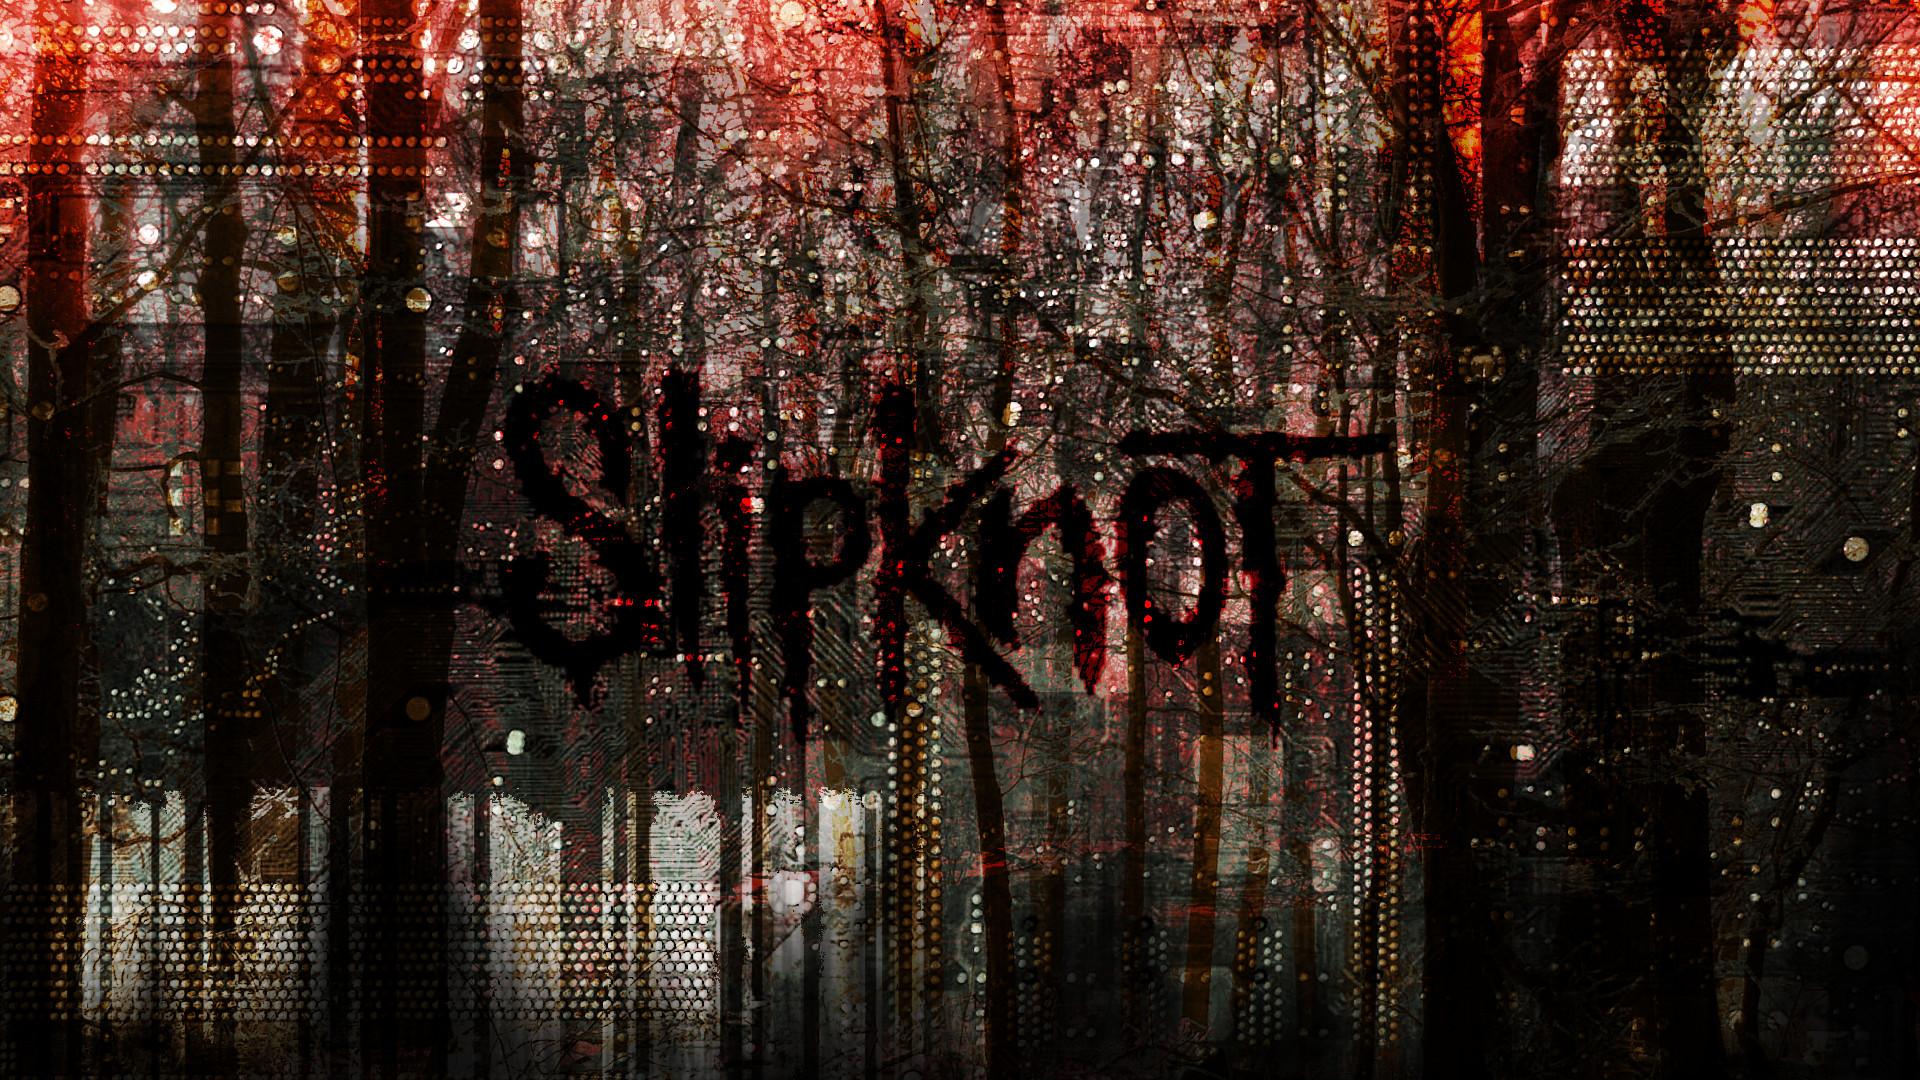 Slipknot 2017 wallpaper 1920x1080 music slipknot nu metal industrial metal heavy metal wallpaper voltagebd Image collections